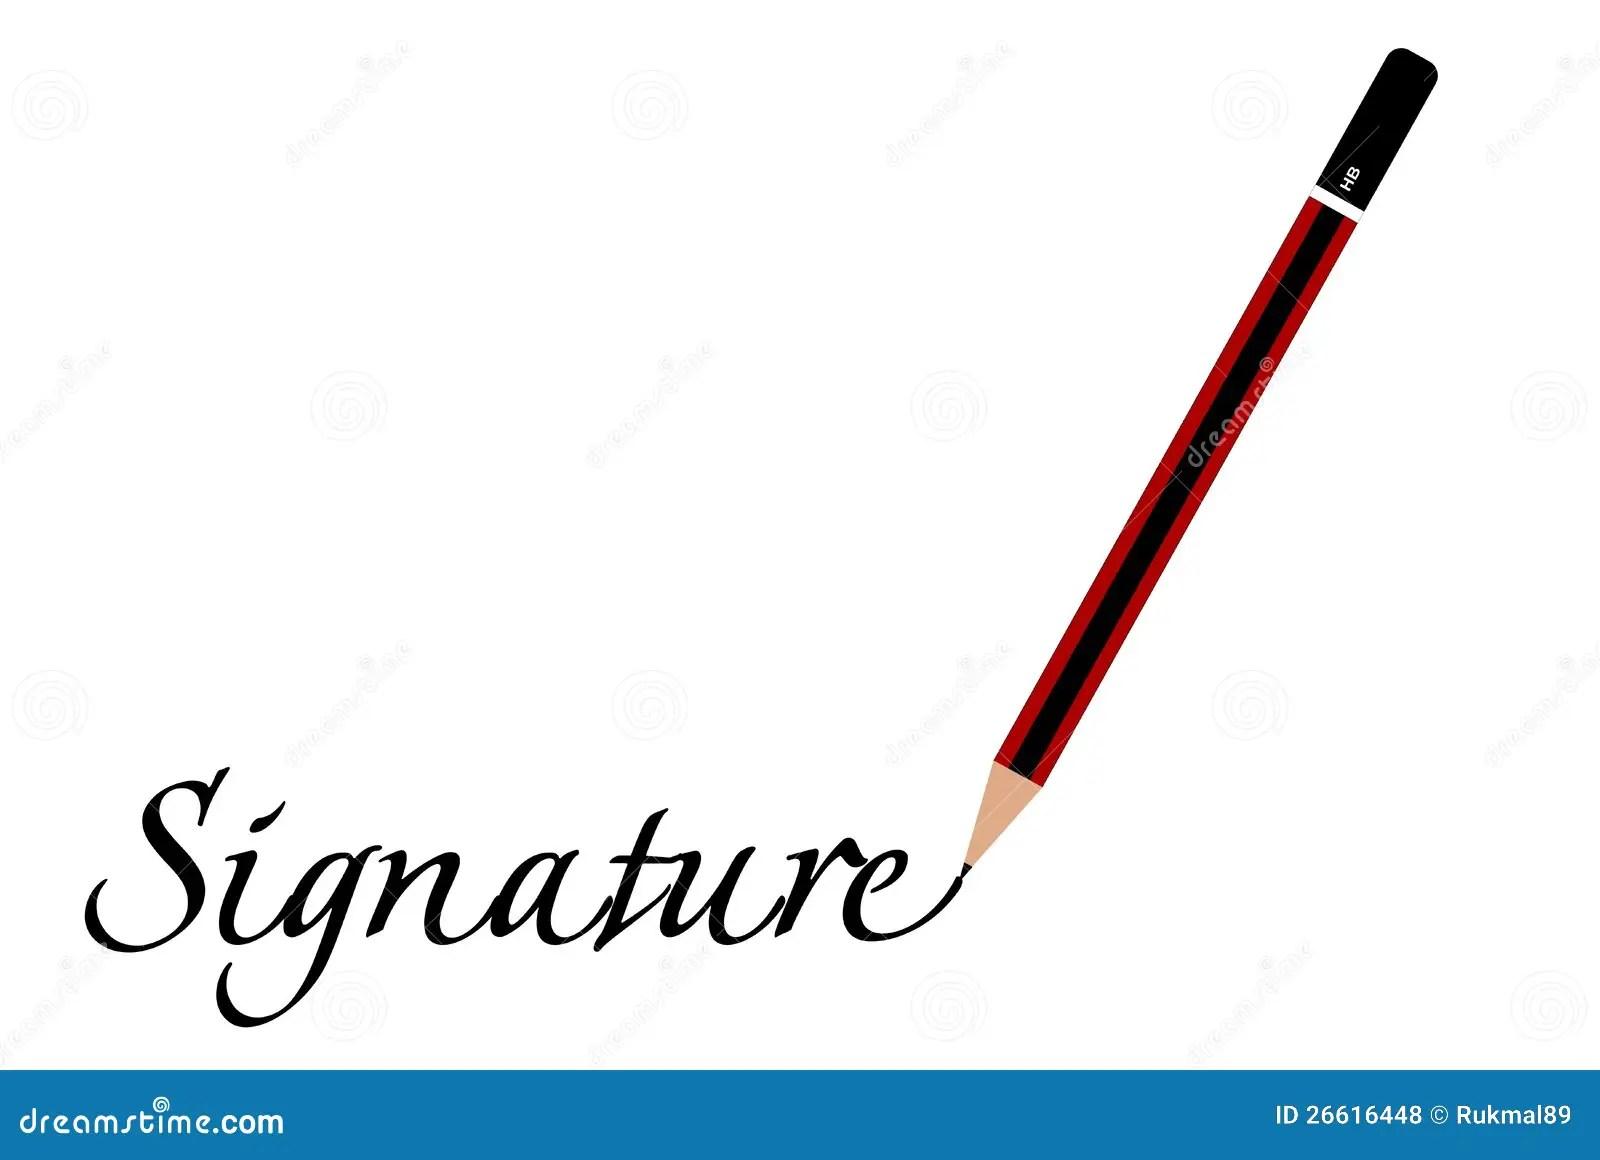 Hb Pencil Royalty Free Stock Photos